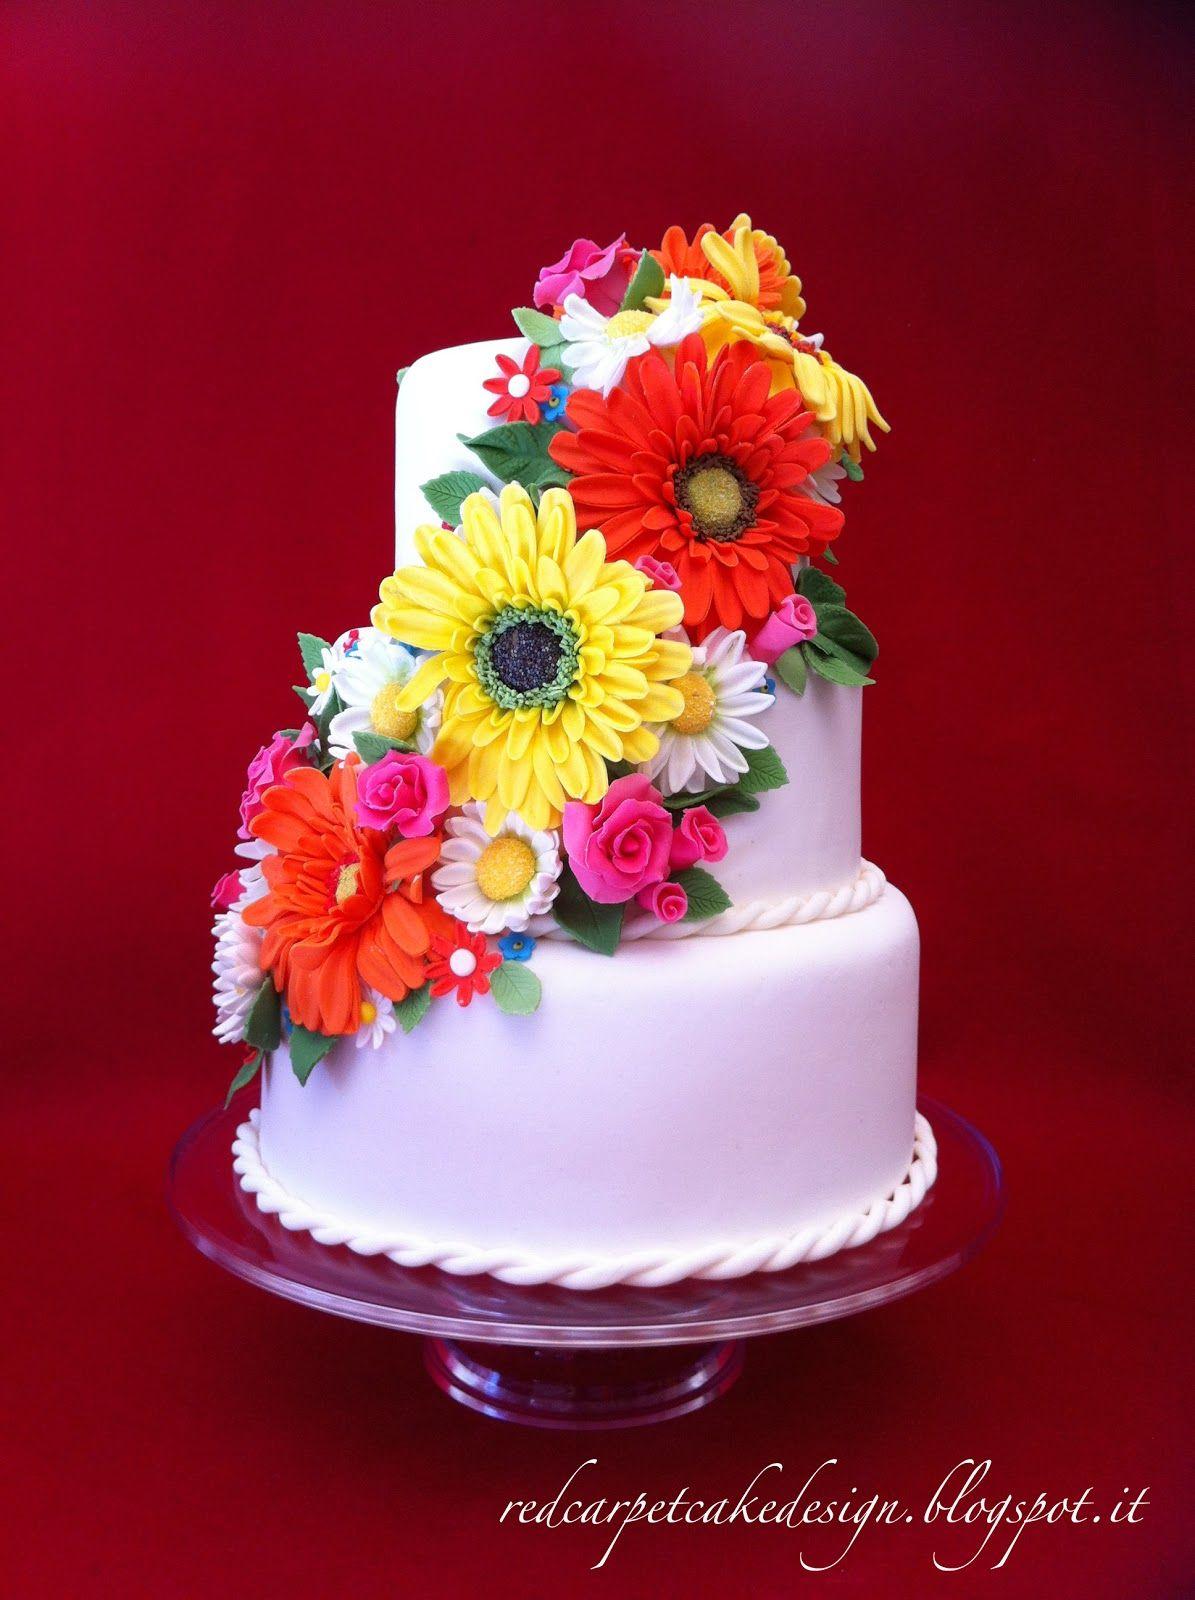 Spring Flowers Cake By Red Carpet Cake Design Red Carpet Cake